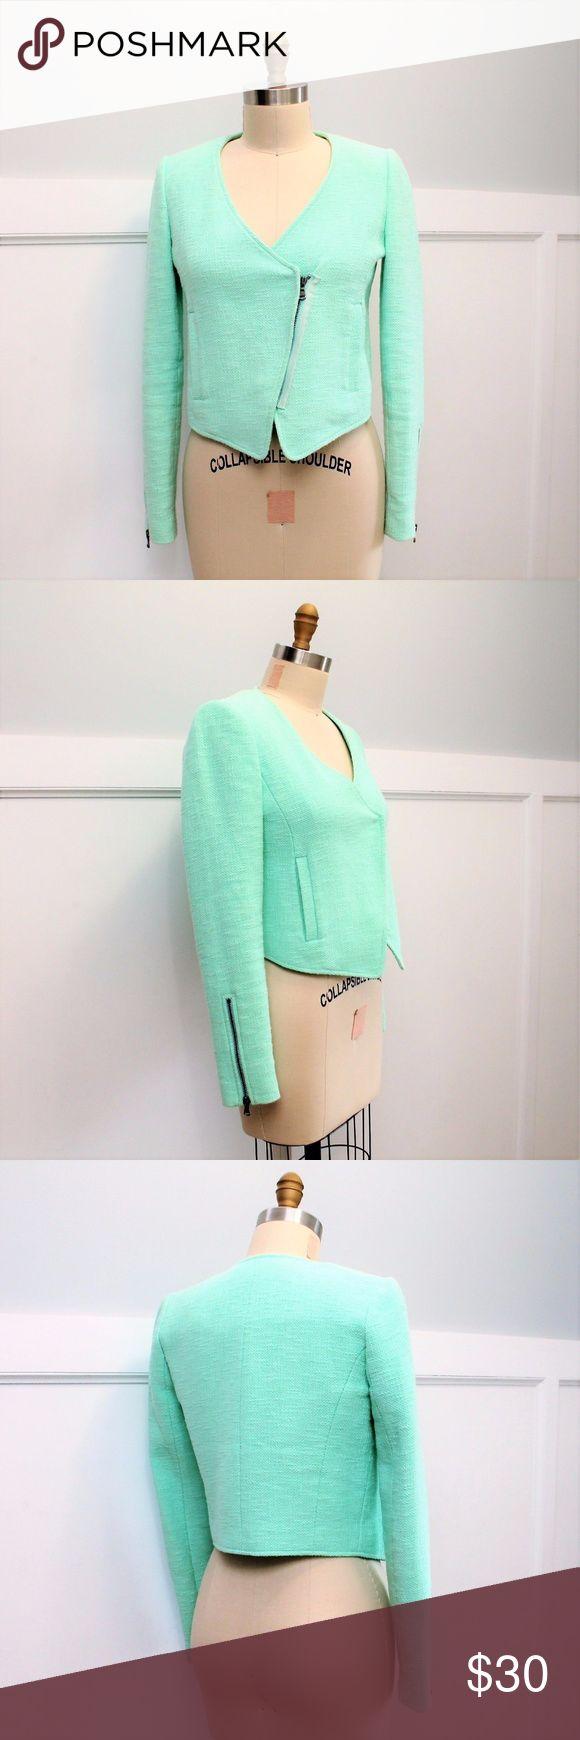 Selling this Tibi Mint Green Moto Jacket on Poshmark! My username is: danapaul. #shopmycloset #poshmark #fashion #shopping #style #forsale #Tibi #Jackets & Blazers